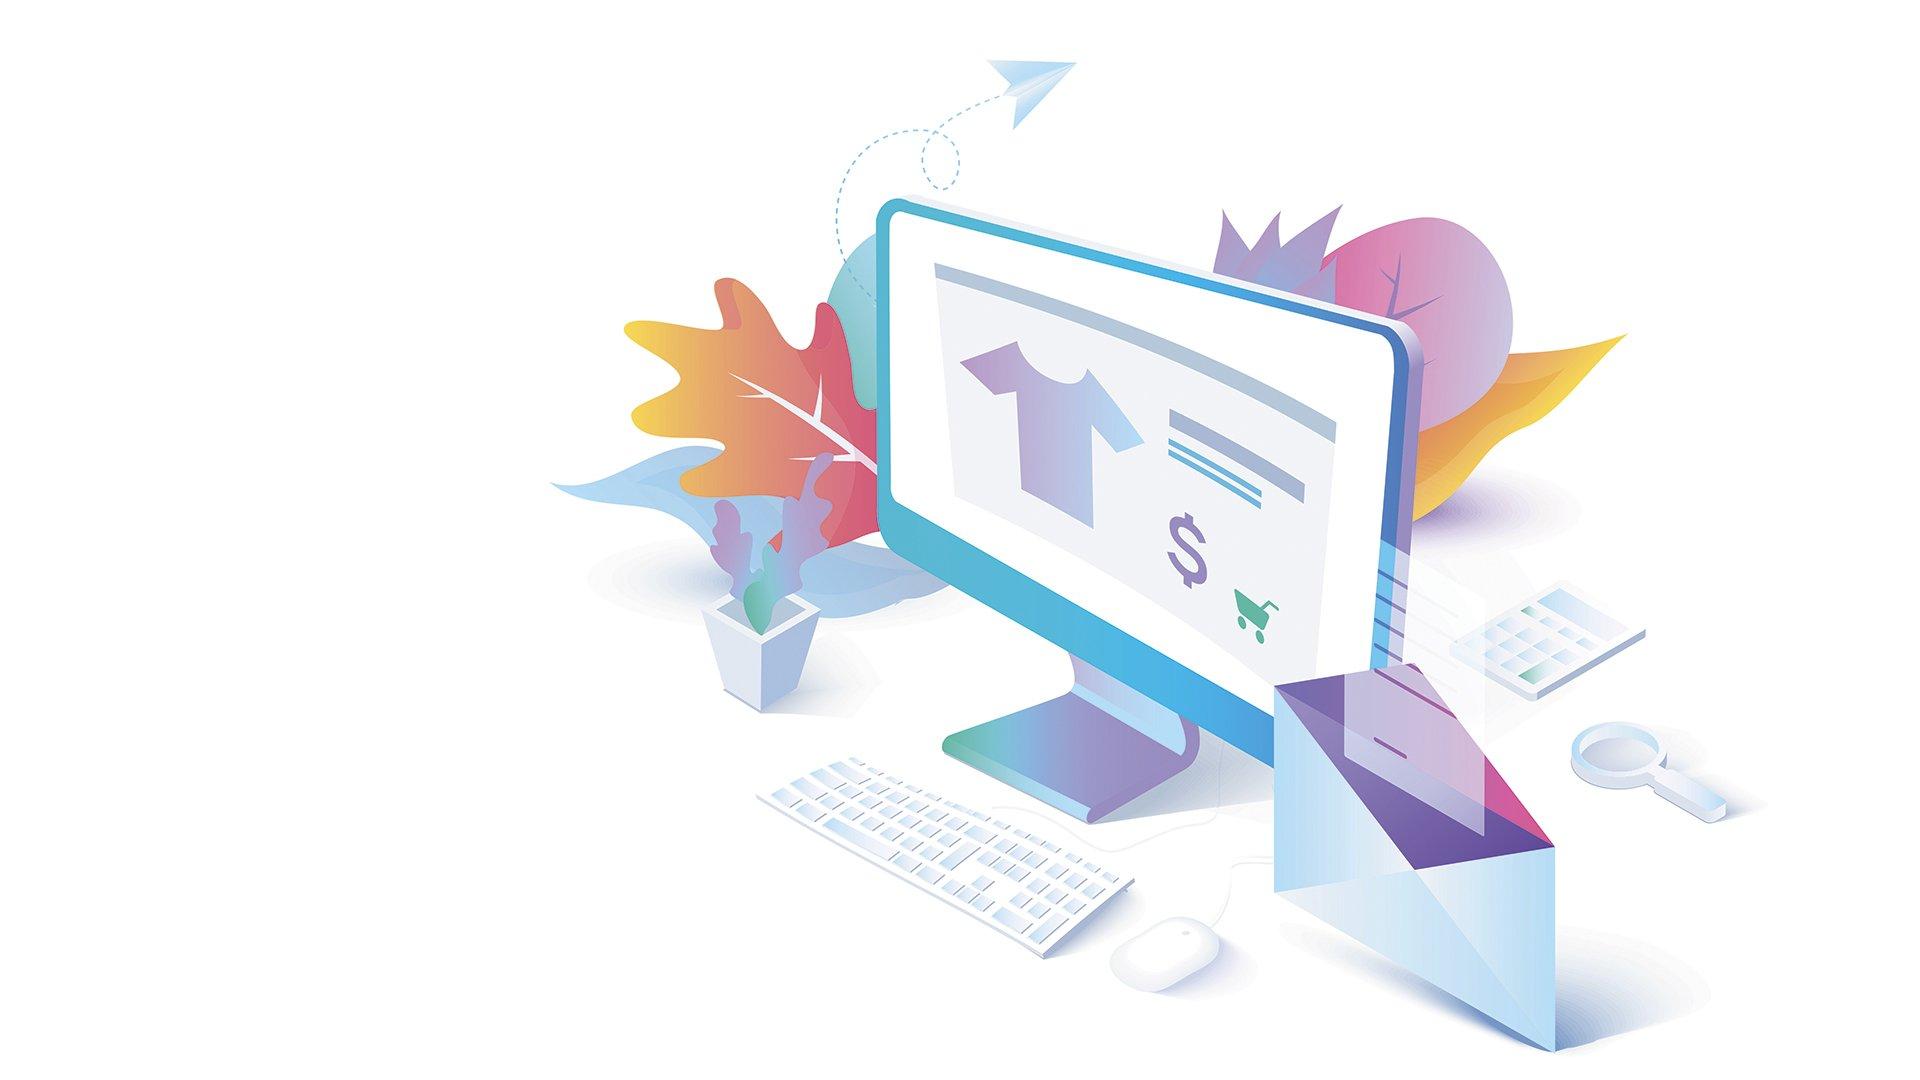 Loomen - Ecommerce ed email marketing: dopo l'acquisto